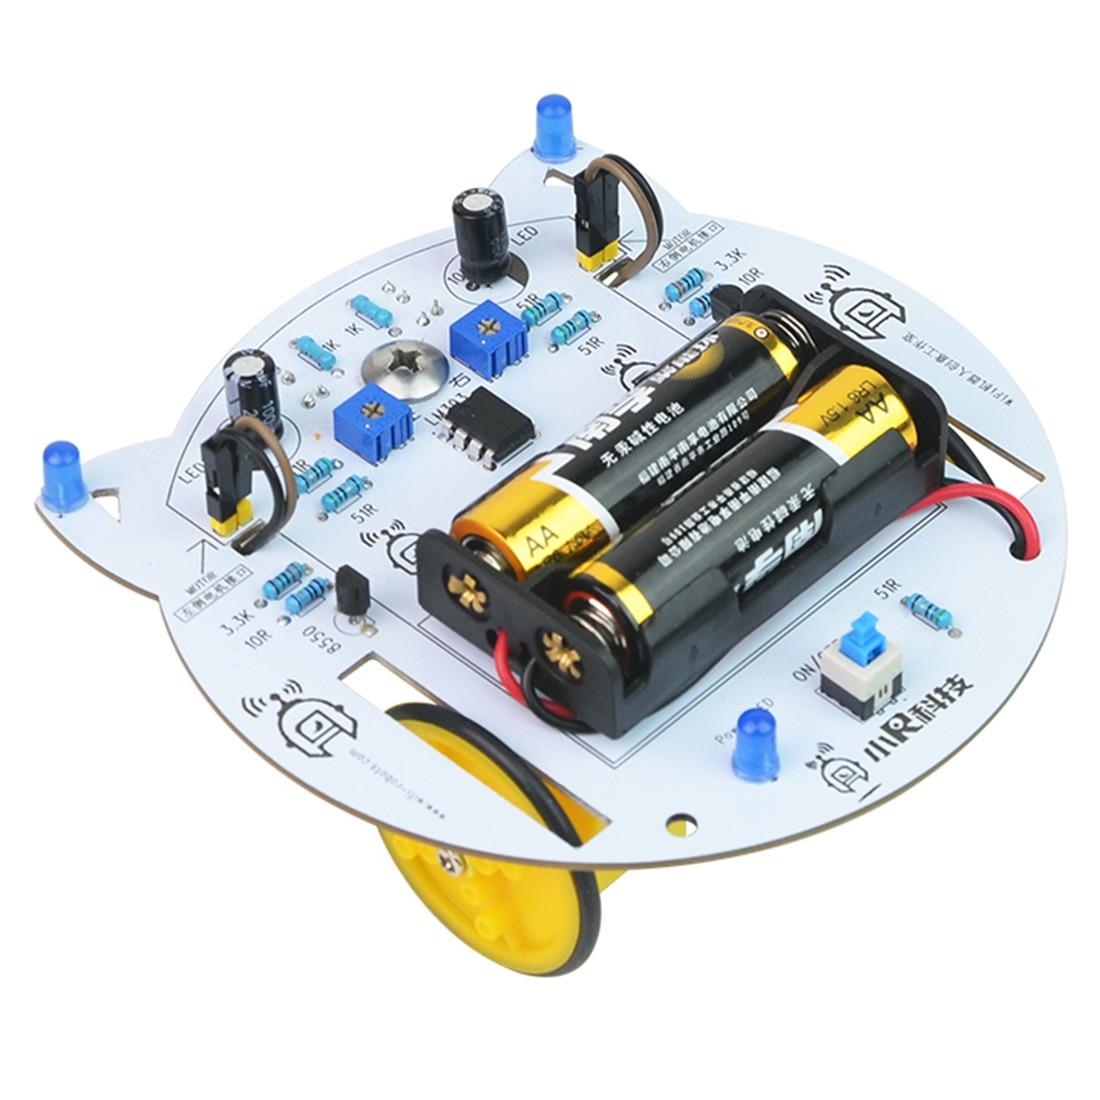 Mini Cat DIY Smart RC Robot Car Tracking STEAM Educational Kit Brain-Training Toy For Children Educational Toys Birthday Gift